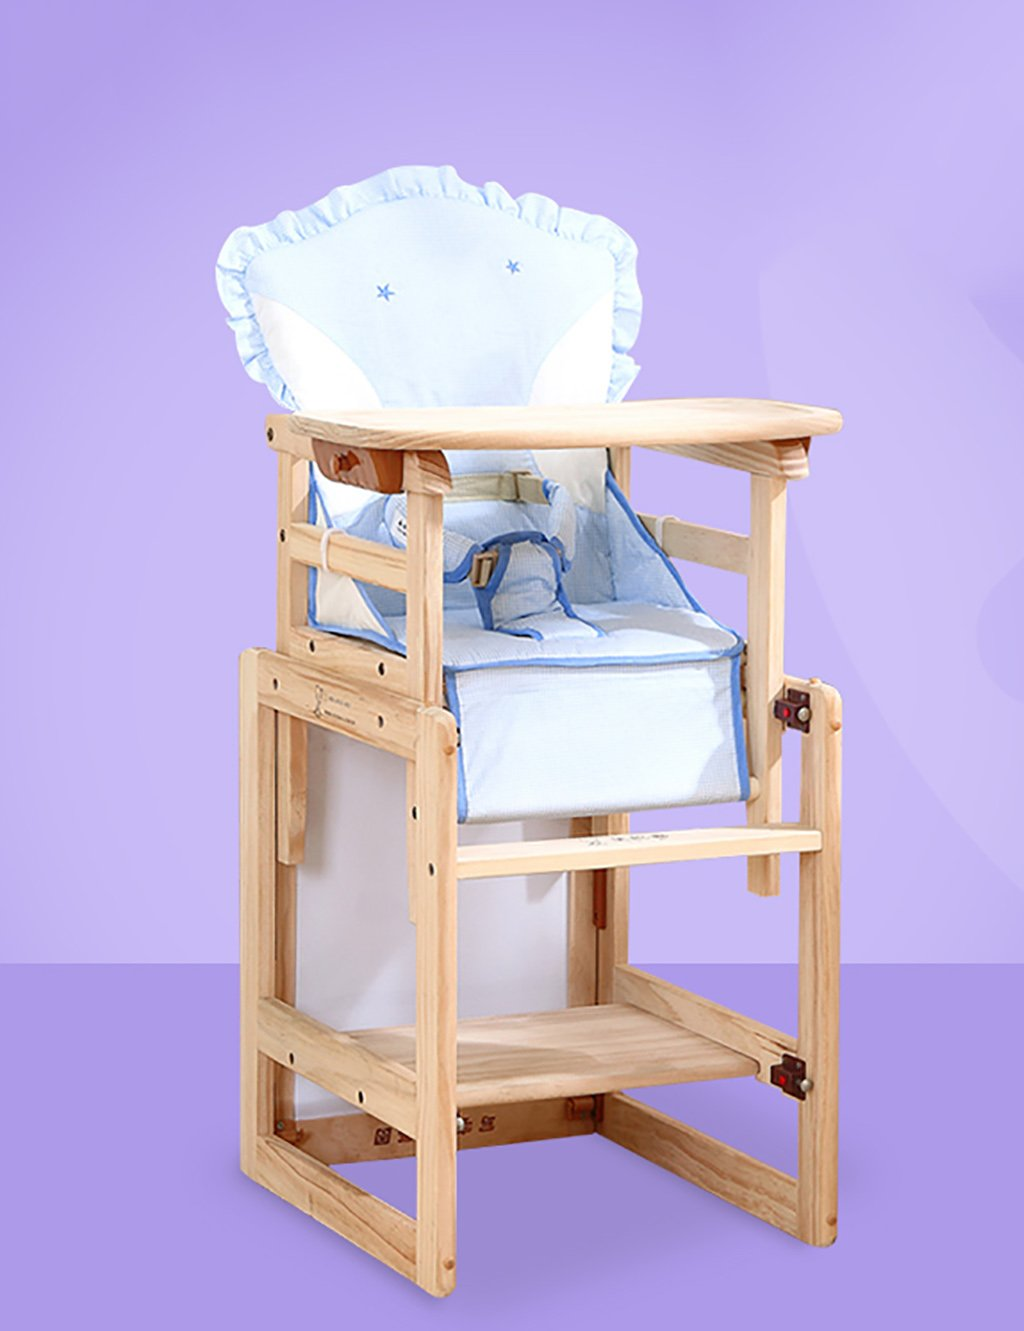 XWZ Sillas para niños Sillas para bebés Sillas Multiuso para niños Sillas de Comedor de Madera Maciza Sillas de bebé Sillas de bebé Silla de Comedor para ...